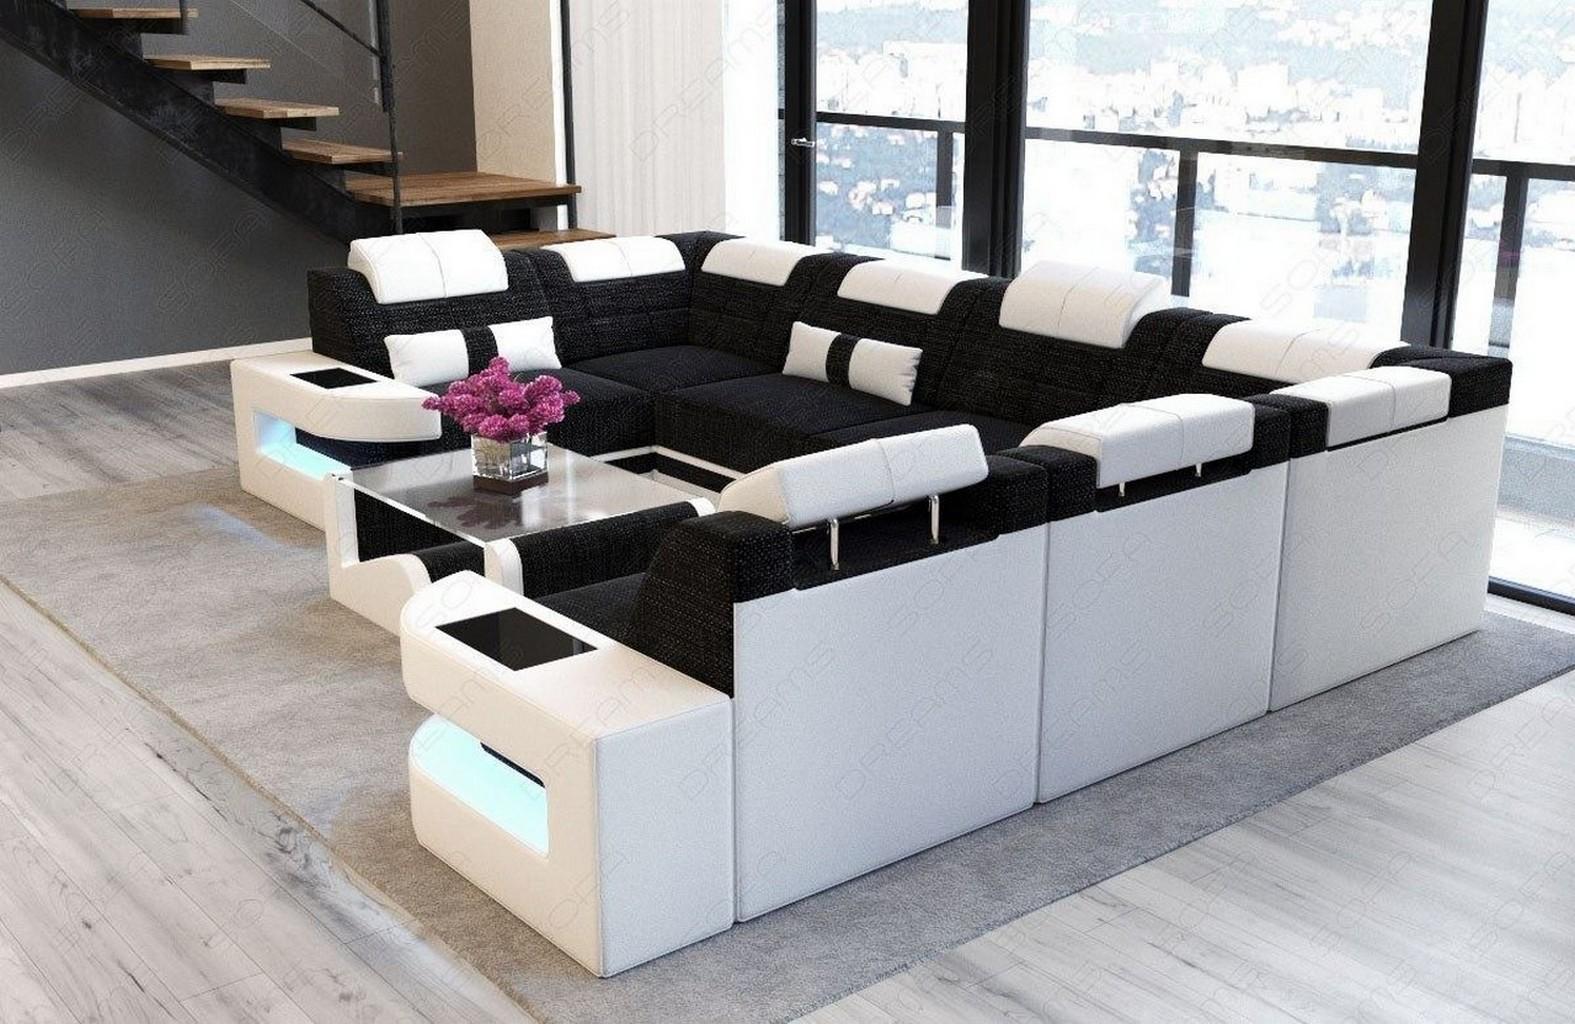 Designer luxus sofa wohnlandschaft como u polsterecke led for Wohnlandschaft u form stoff